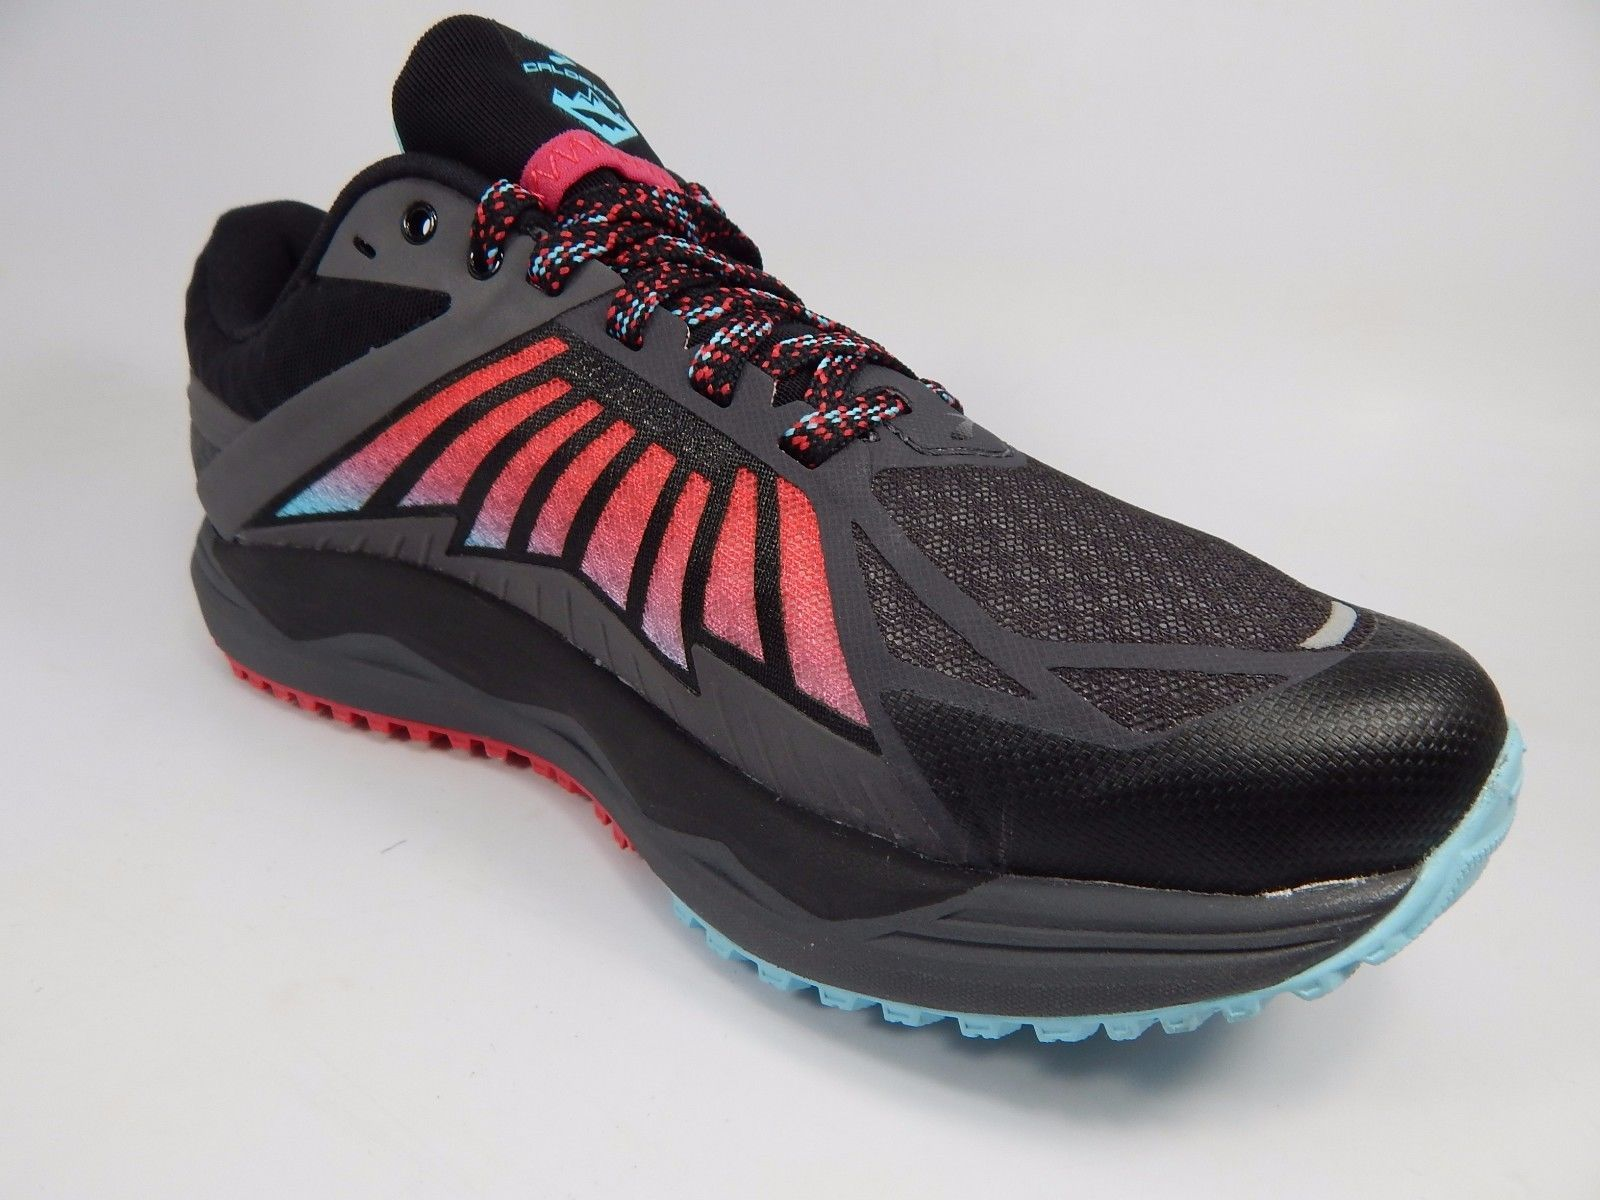 SINGLE LEFT SHOE Brooks Caldera Women's Running Shoe Size US 8.5 M (B) EU 40